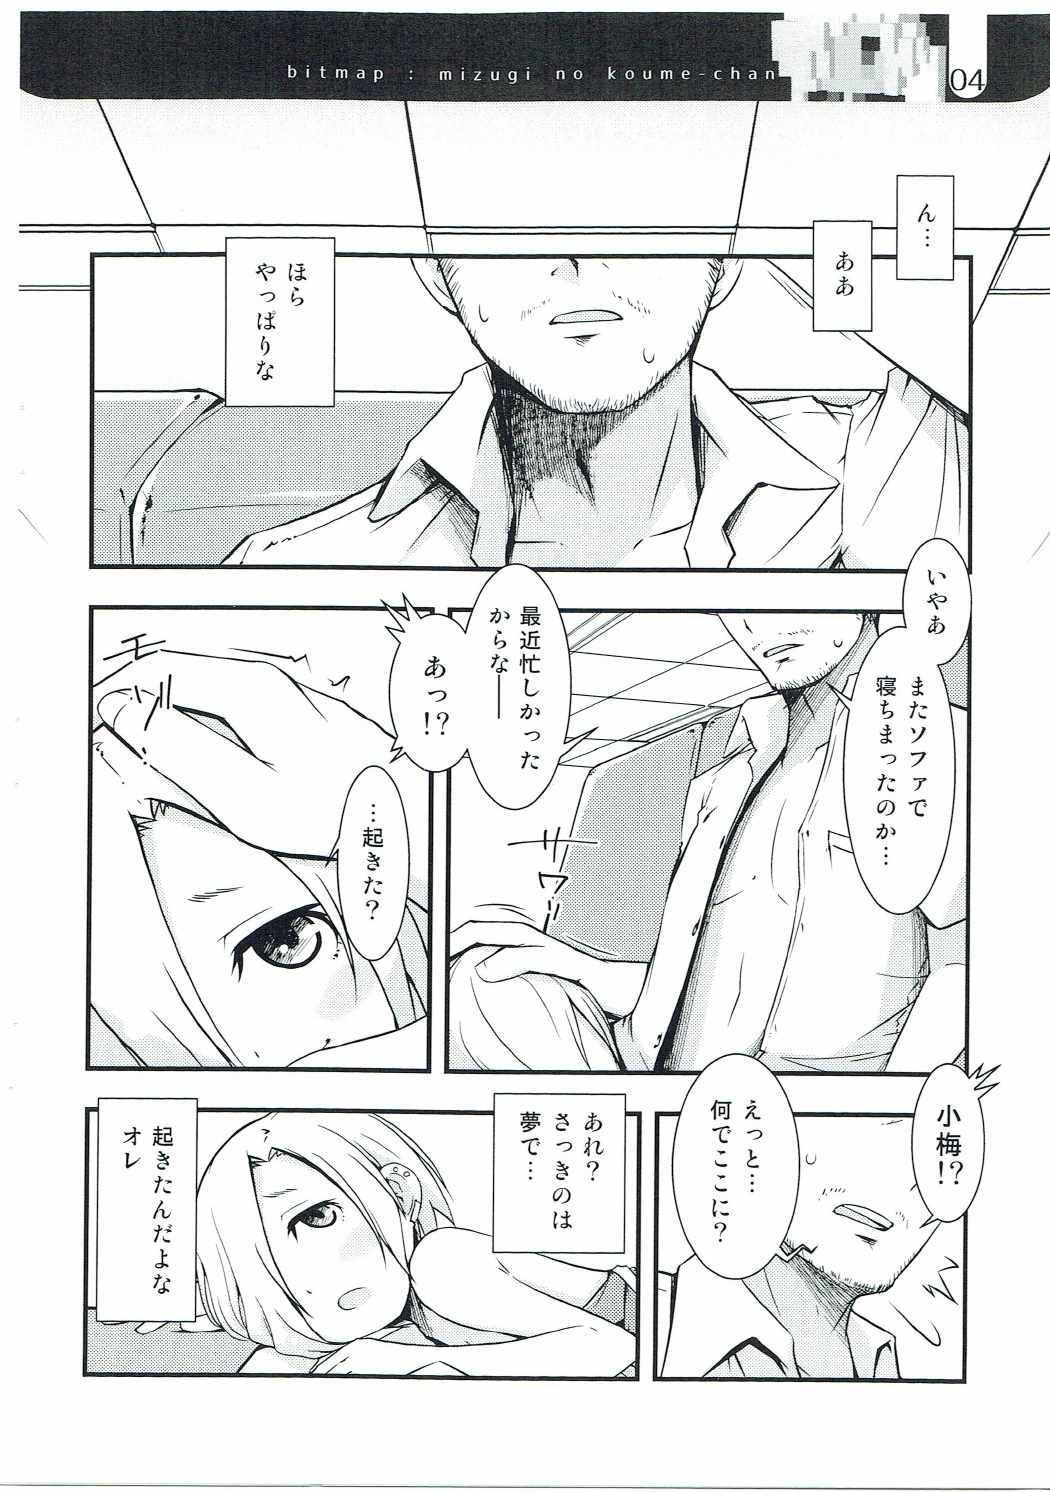 Mizugi na Koume-chan 3